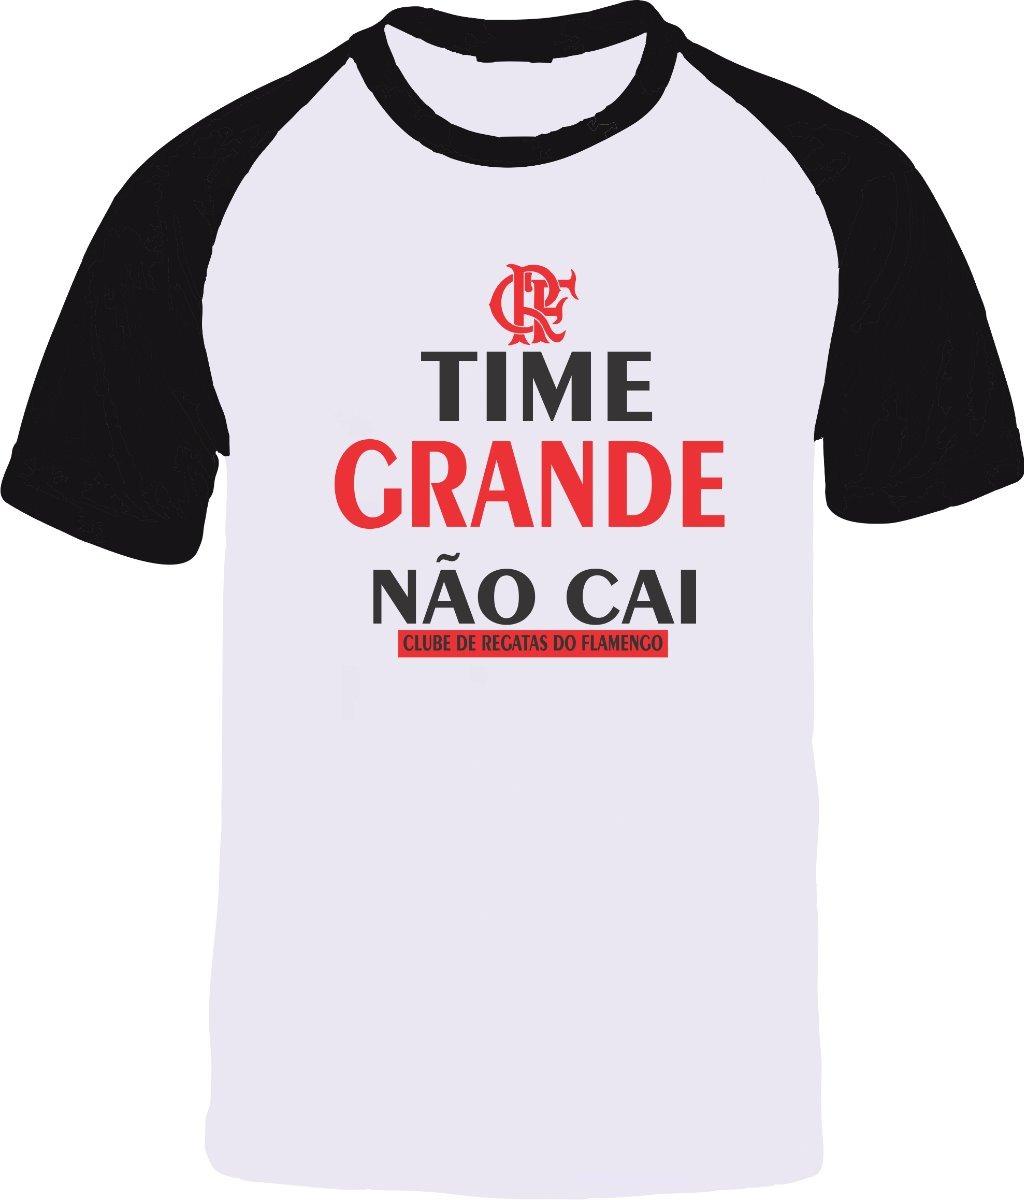 Camisa Personalizada Raglan Frase Futebol Mengão Time Grande